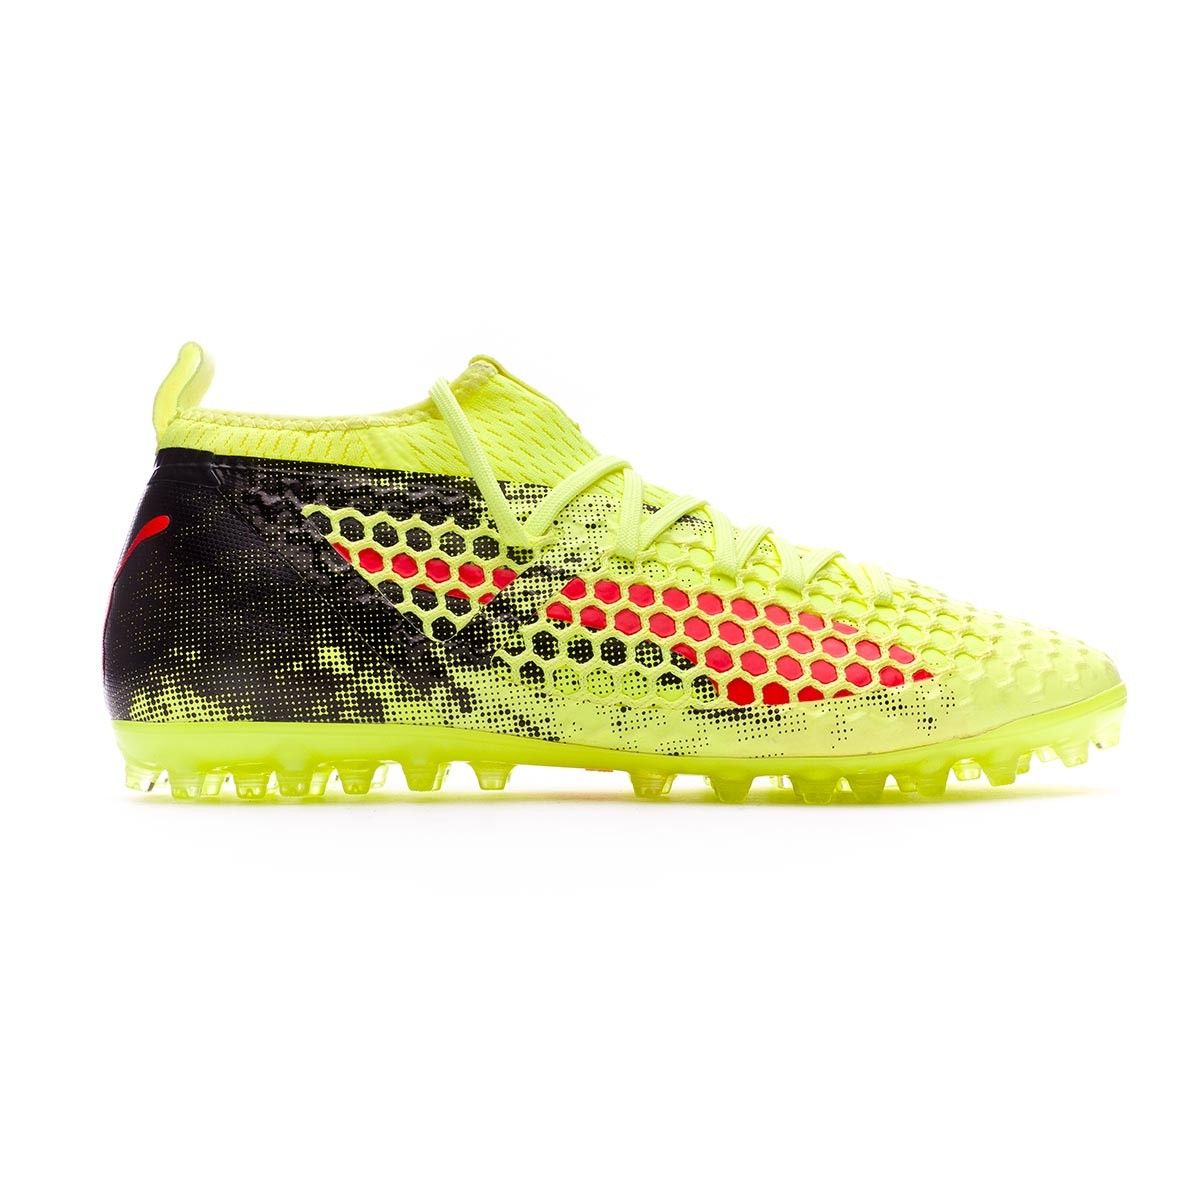 Blast Future fútbol Amarillo 2 18 MG Puma Zapatos Fizzy de MG 18 Netfit Rojo f55e2f